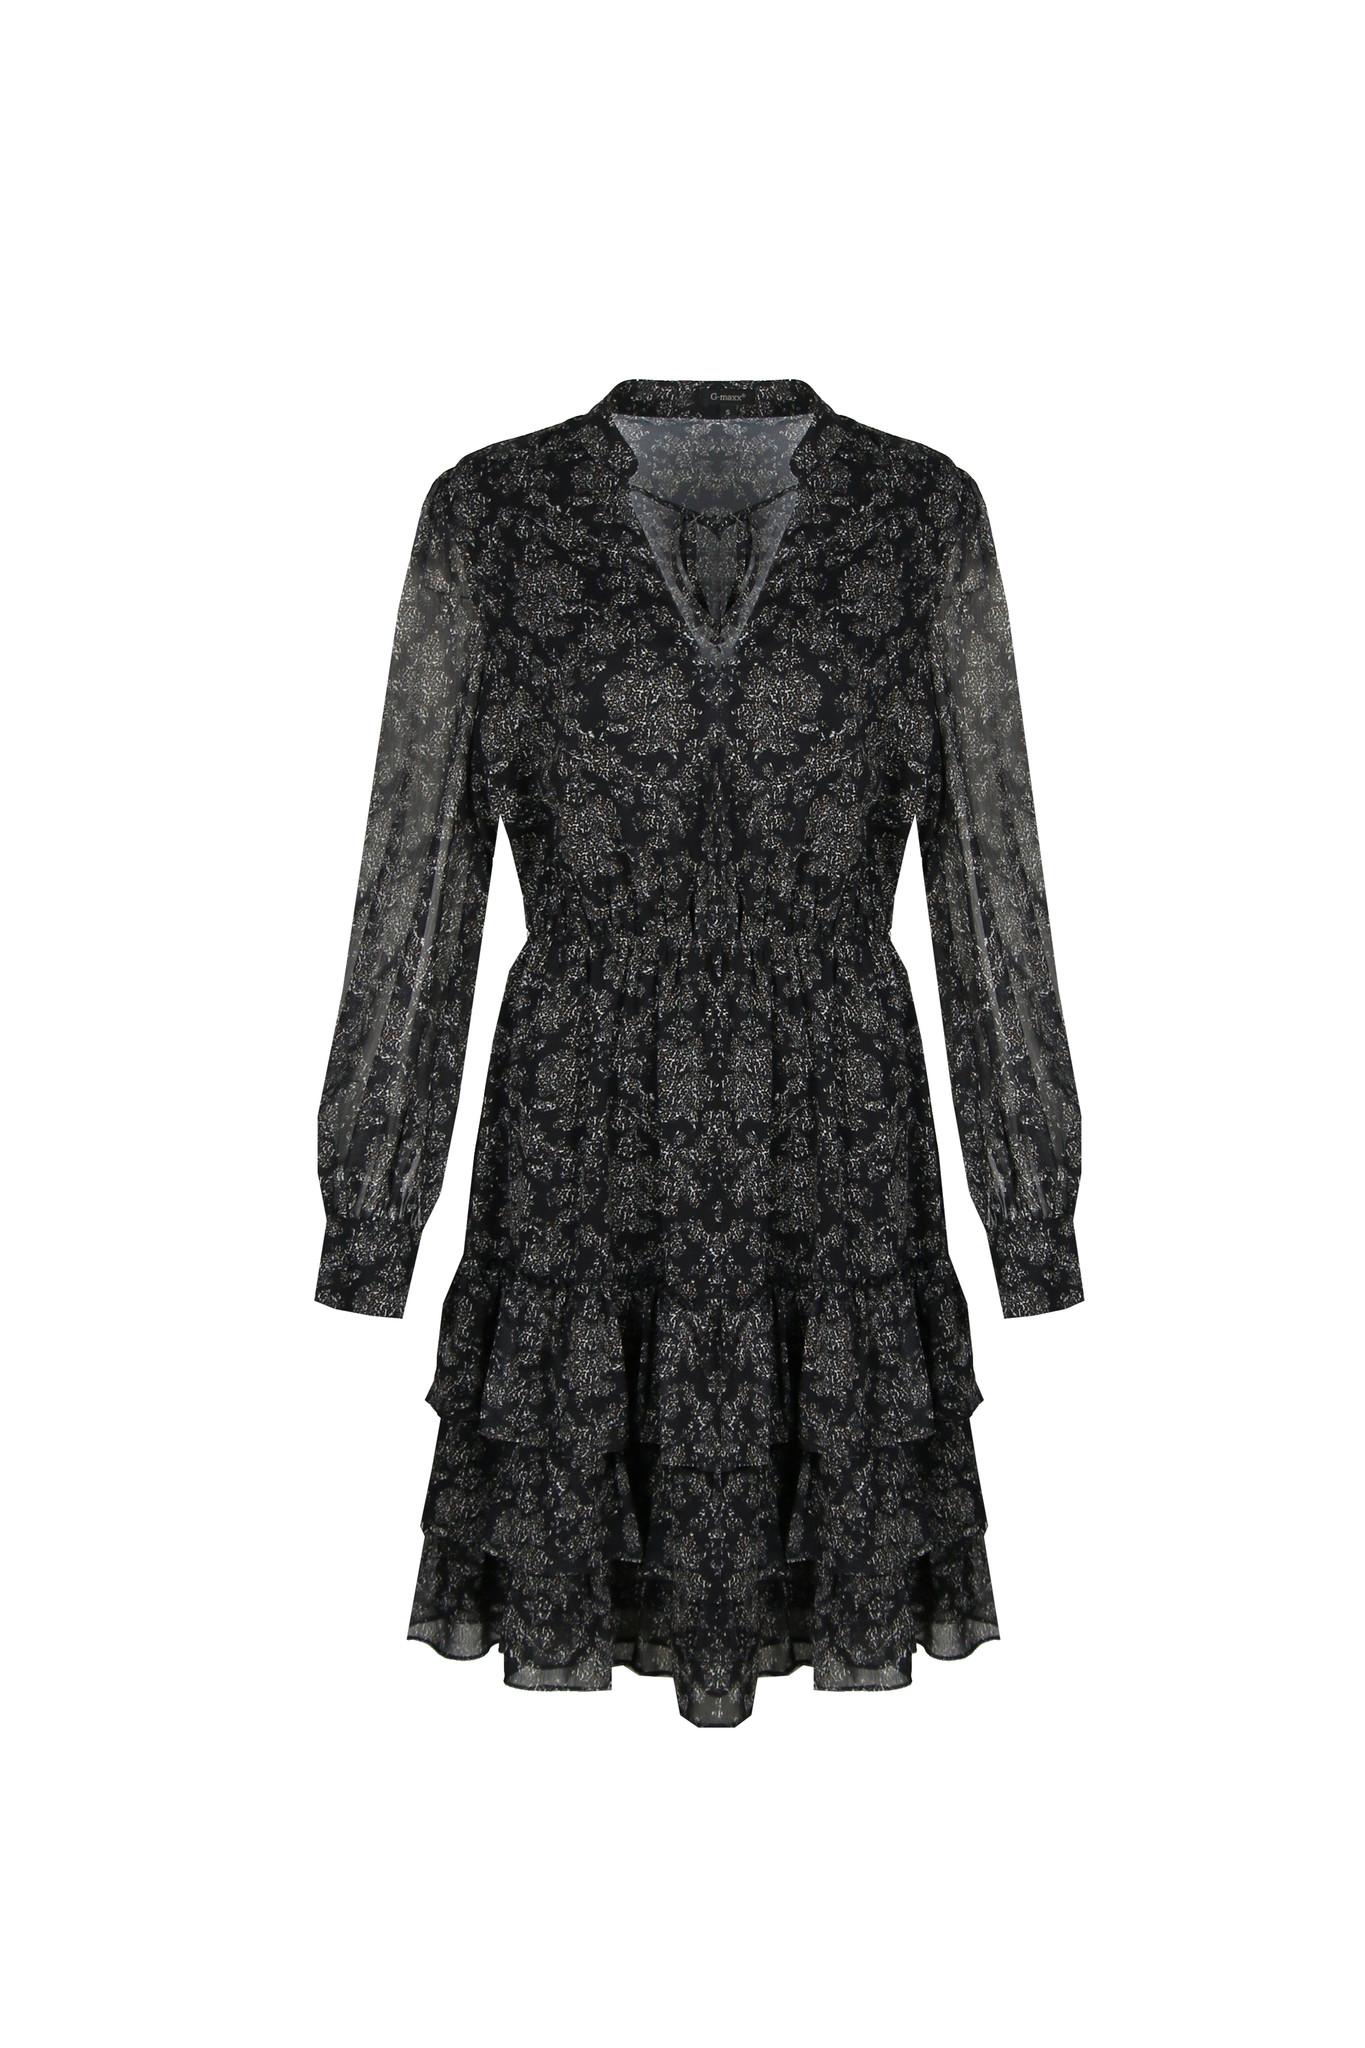 G-Maxx G-Maxx Harmony jurk zwart/roomwit